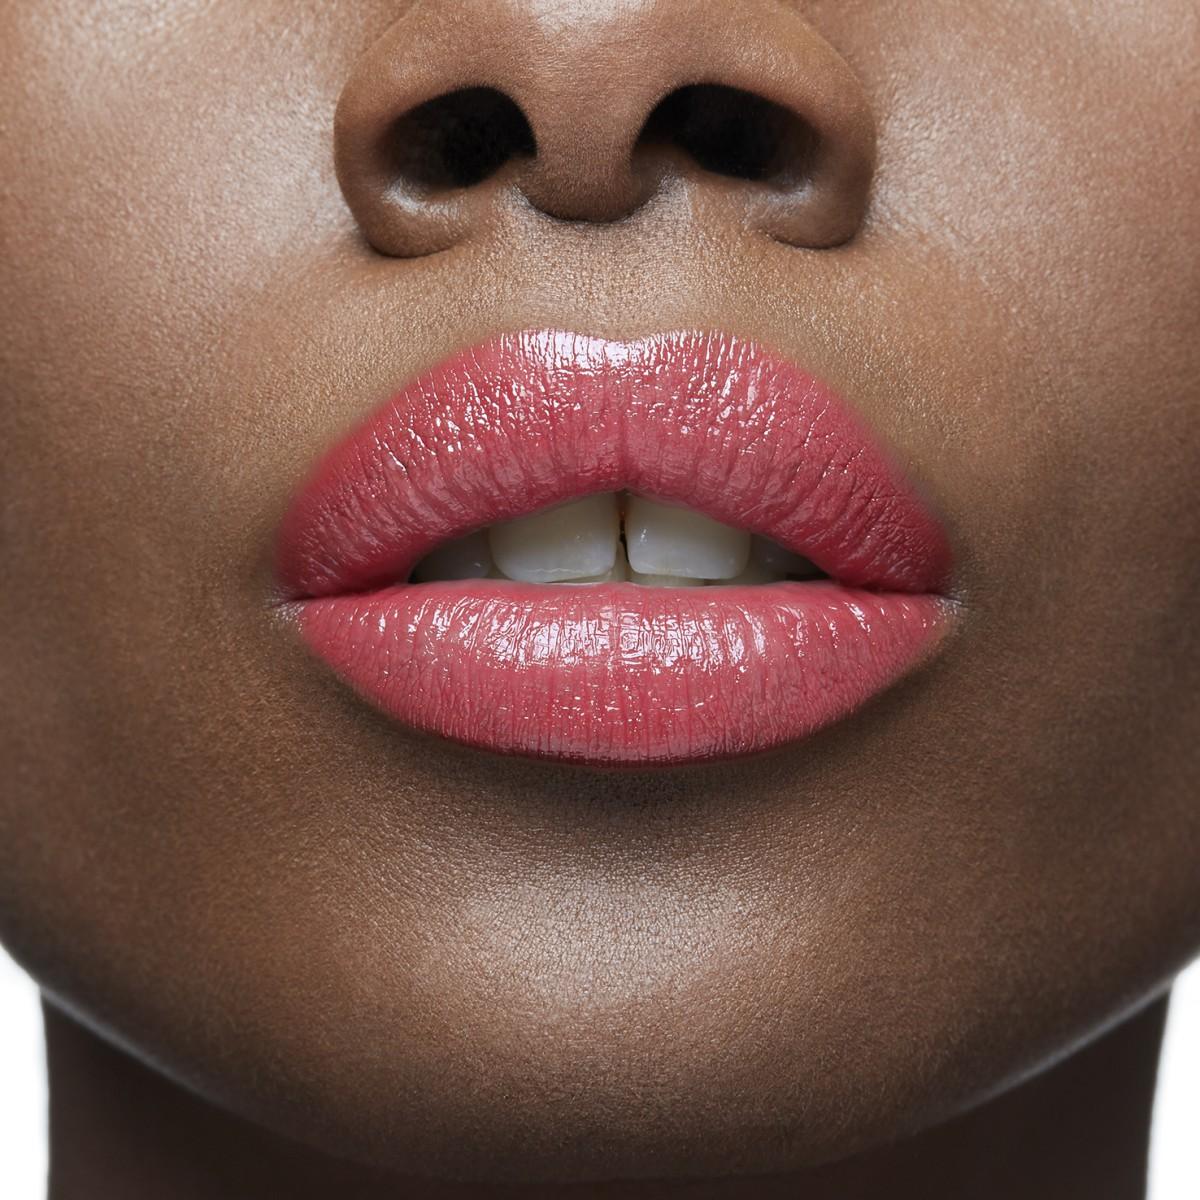 Woman Beauty - リップカラー トレベア 115s - Christian Louboutin